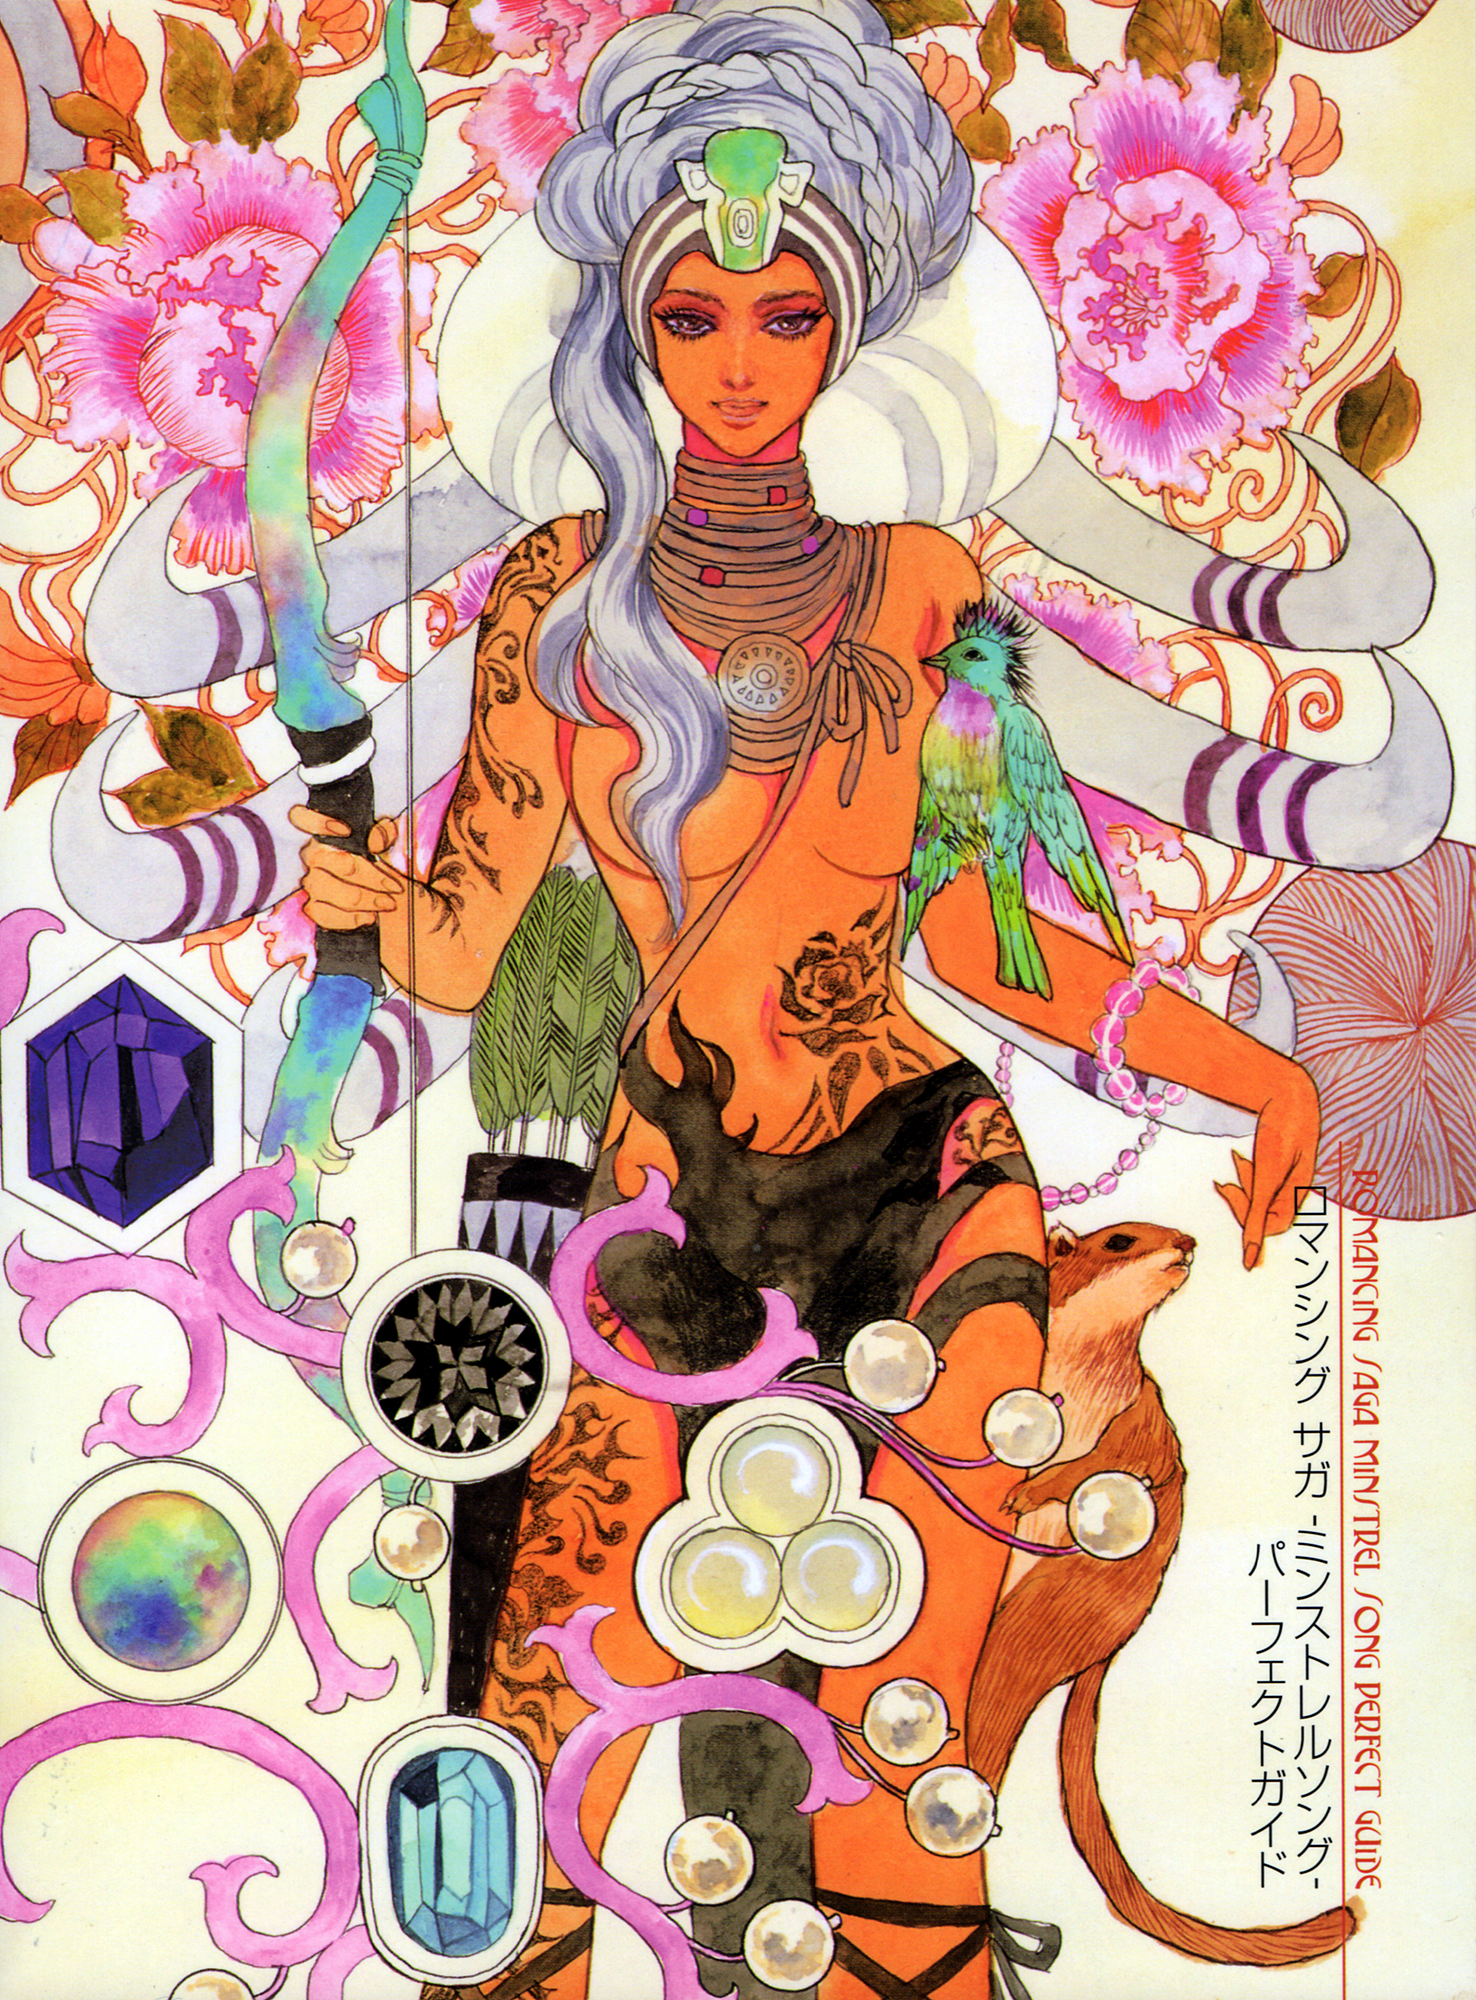 By Tomomi Kobayashi (小林 智美), artwork fom 'Romancing SaGa